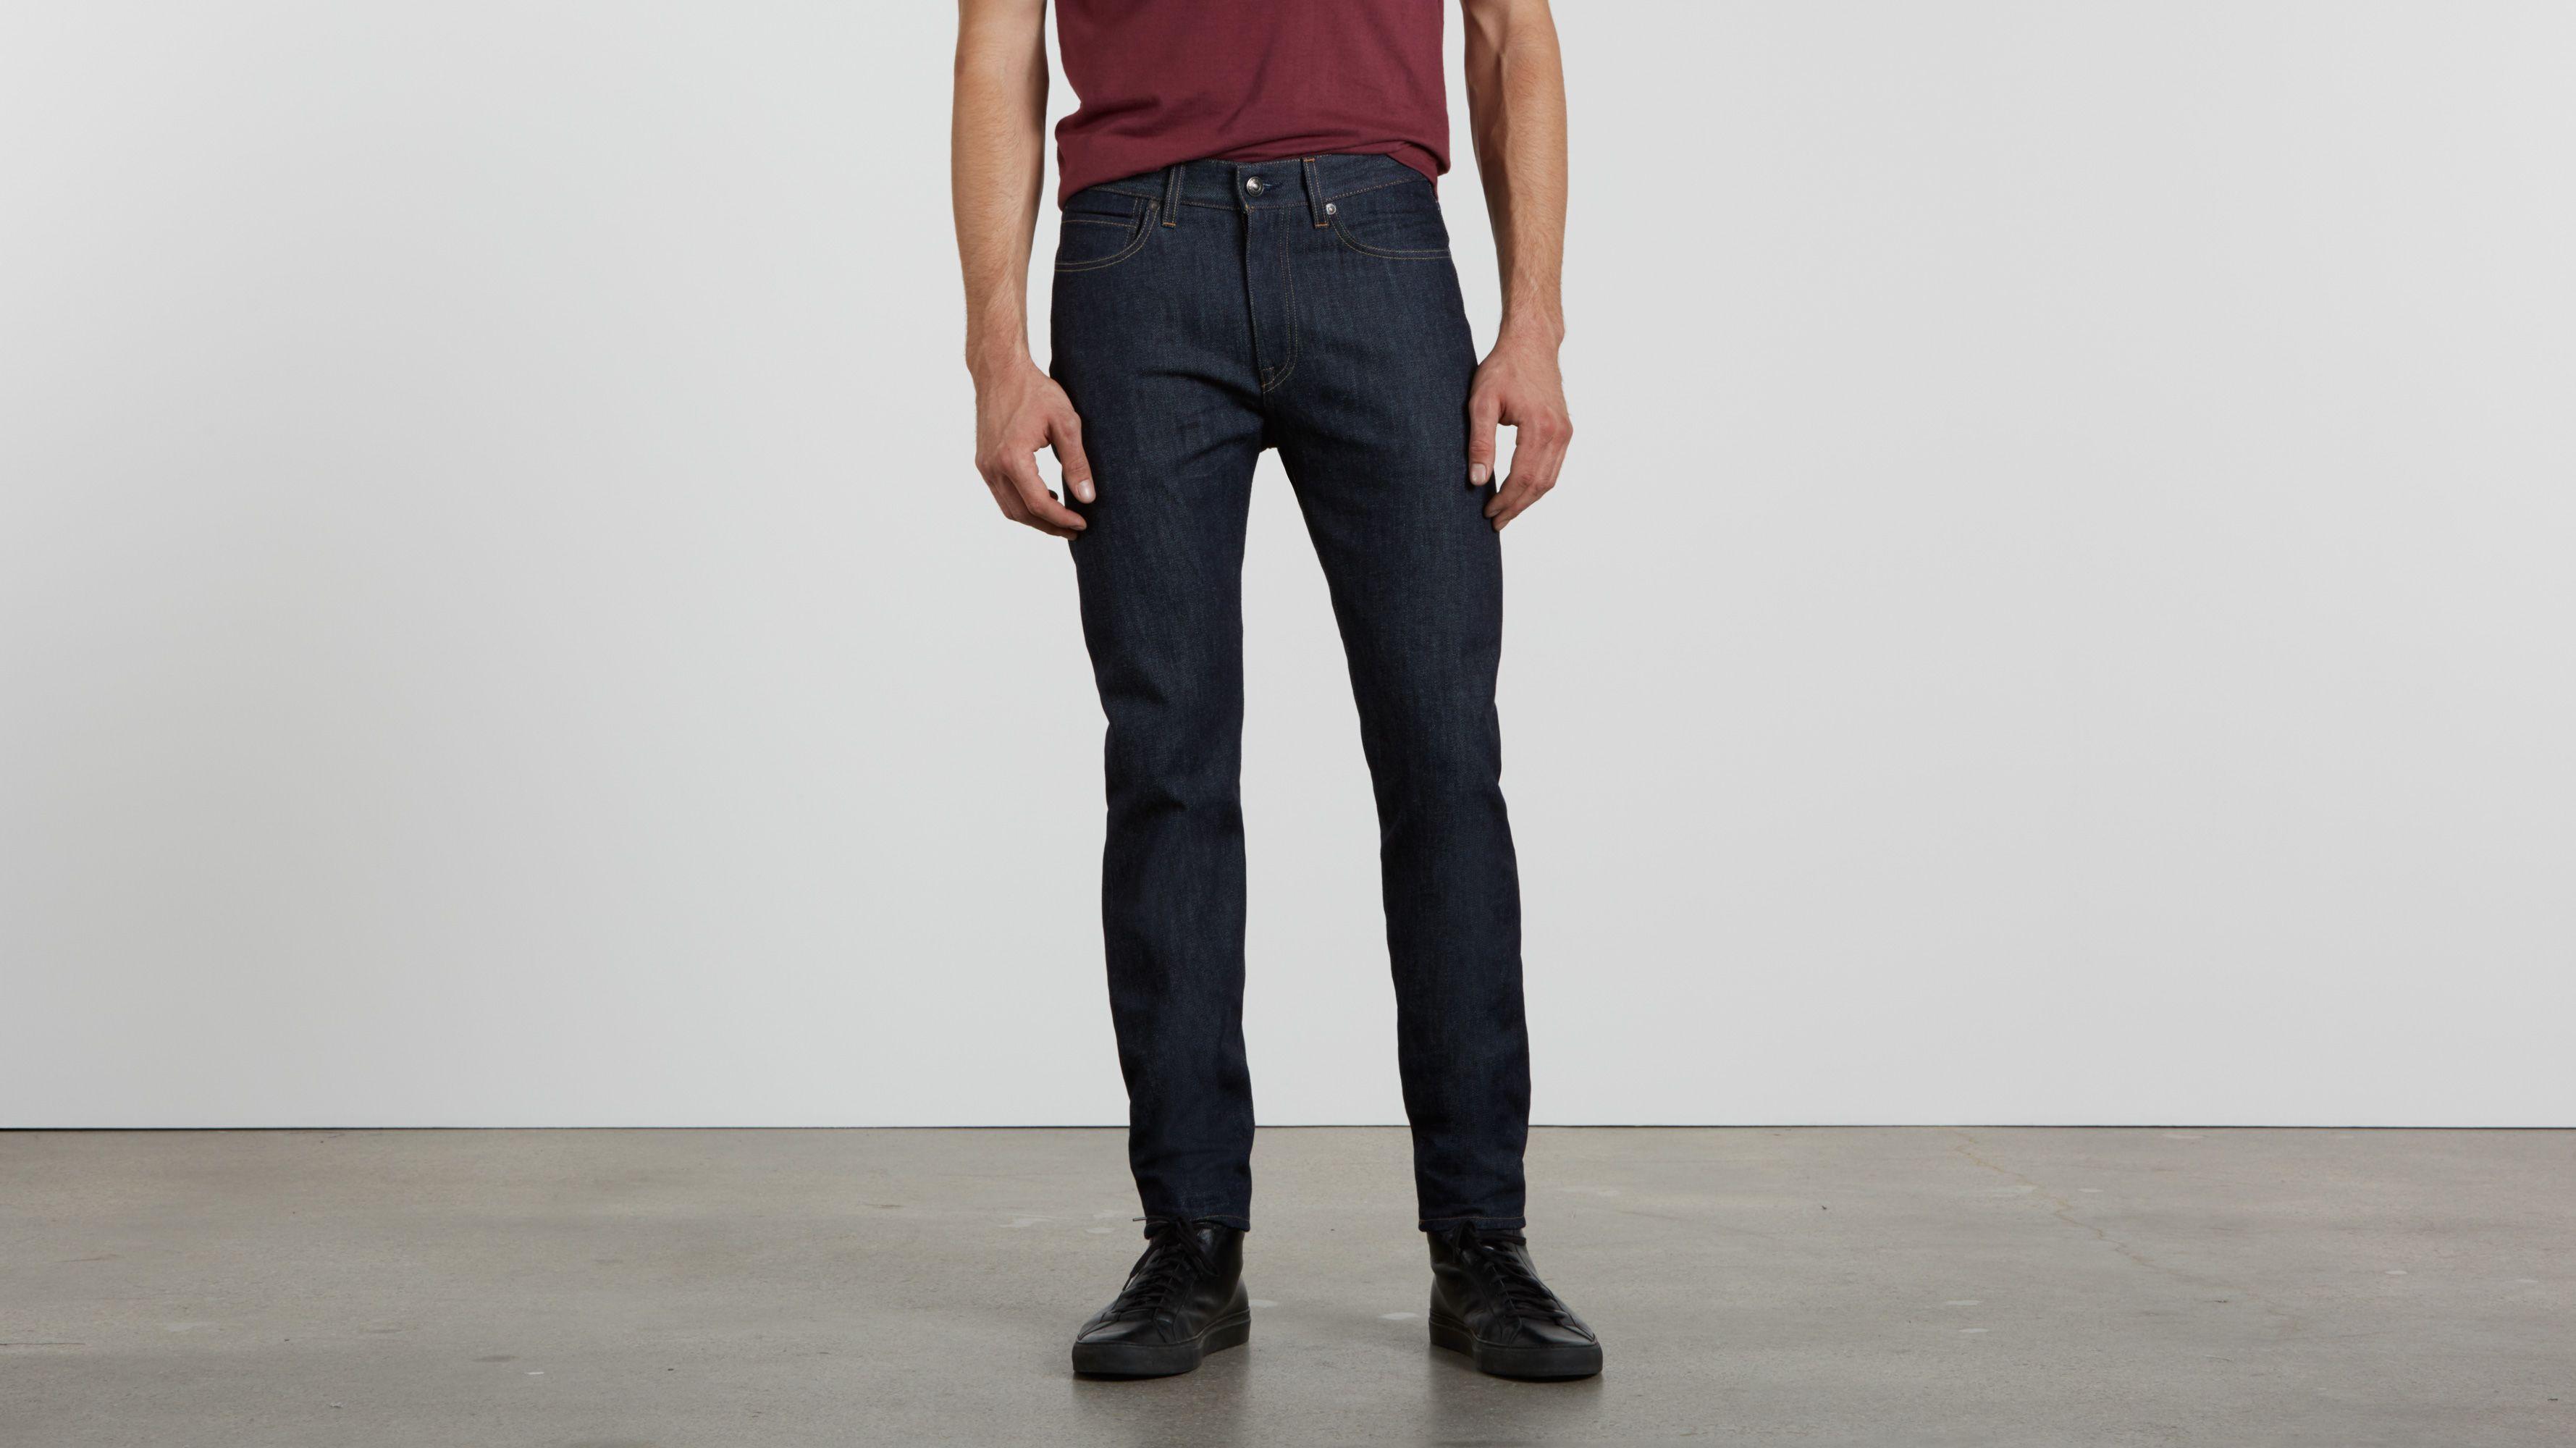 Needle Narrow Jeans - Rigid